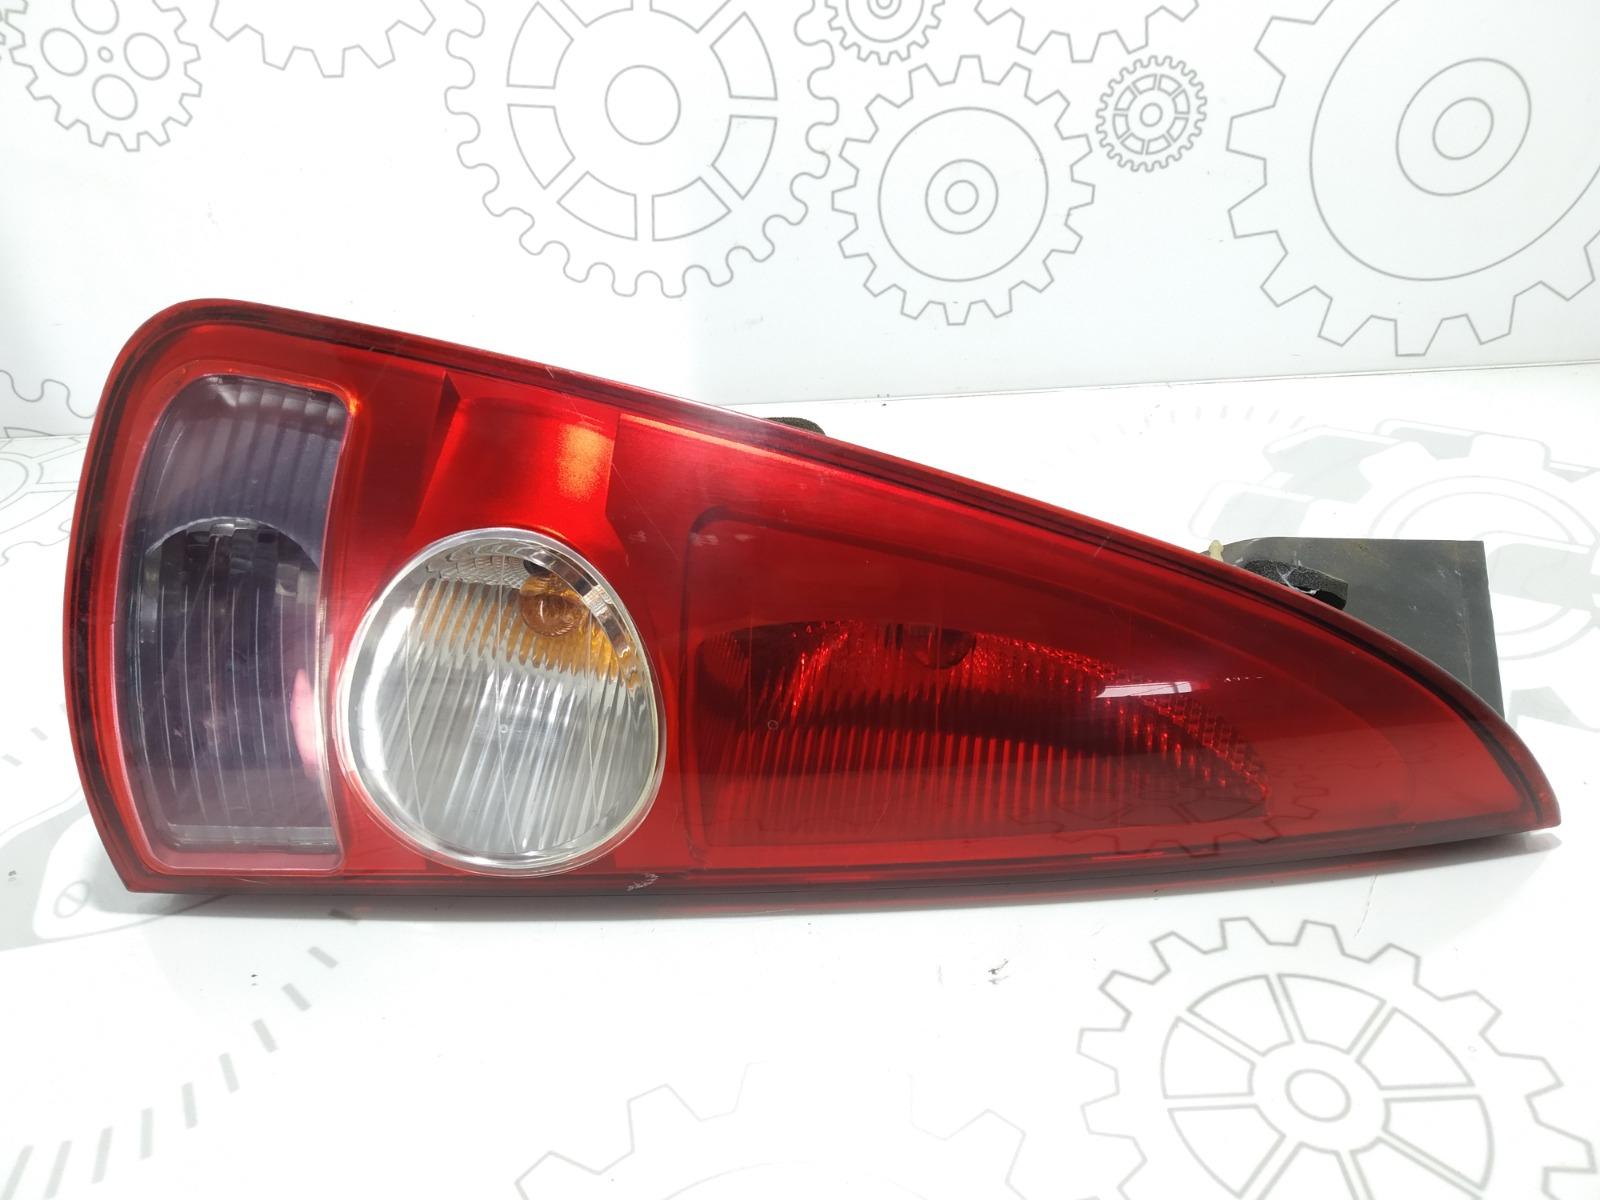 Фонарь задний левый Renault Grand Espace 3.0 DCI 2005 (б/у)